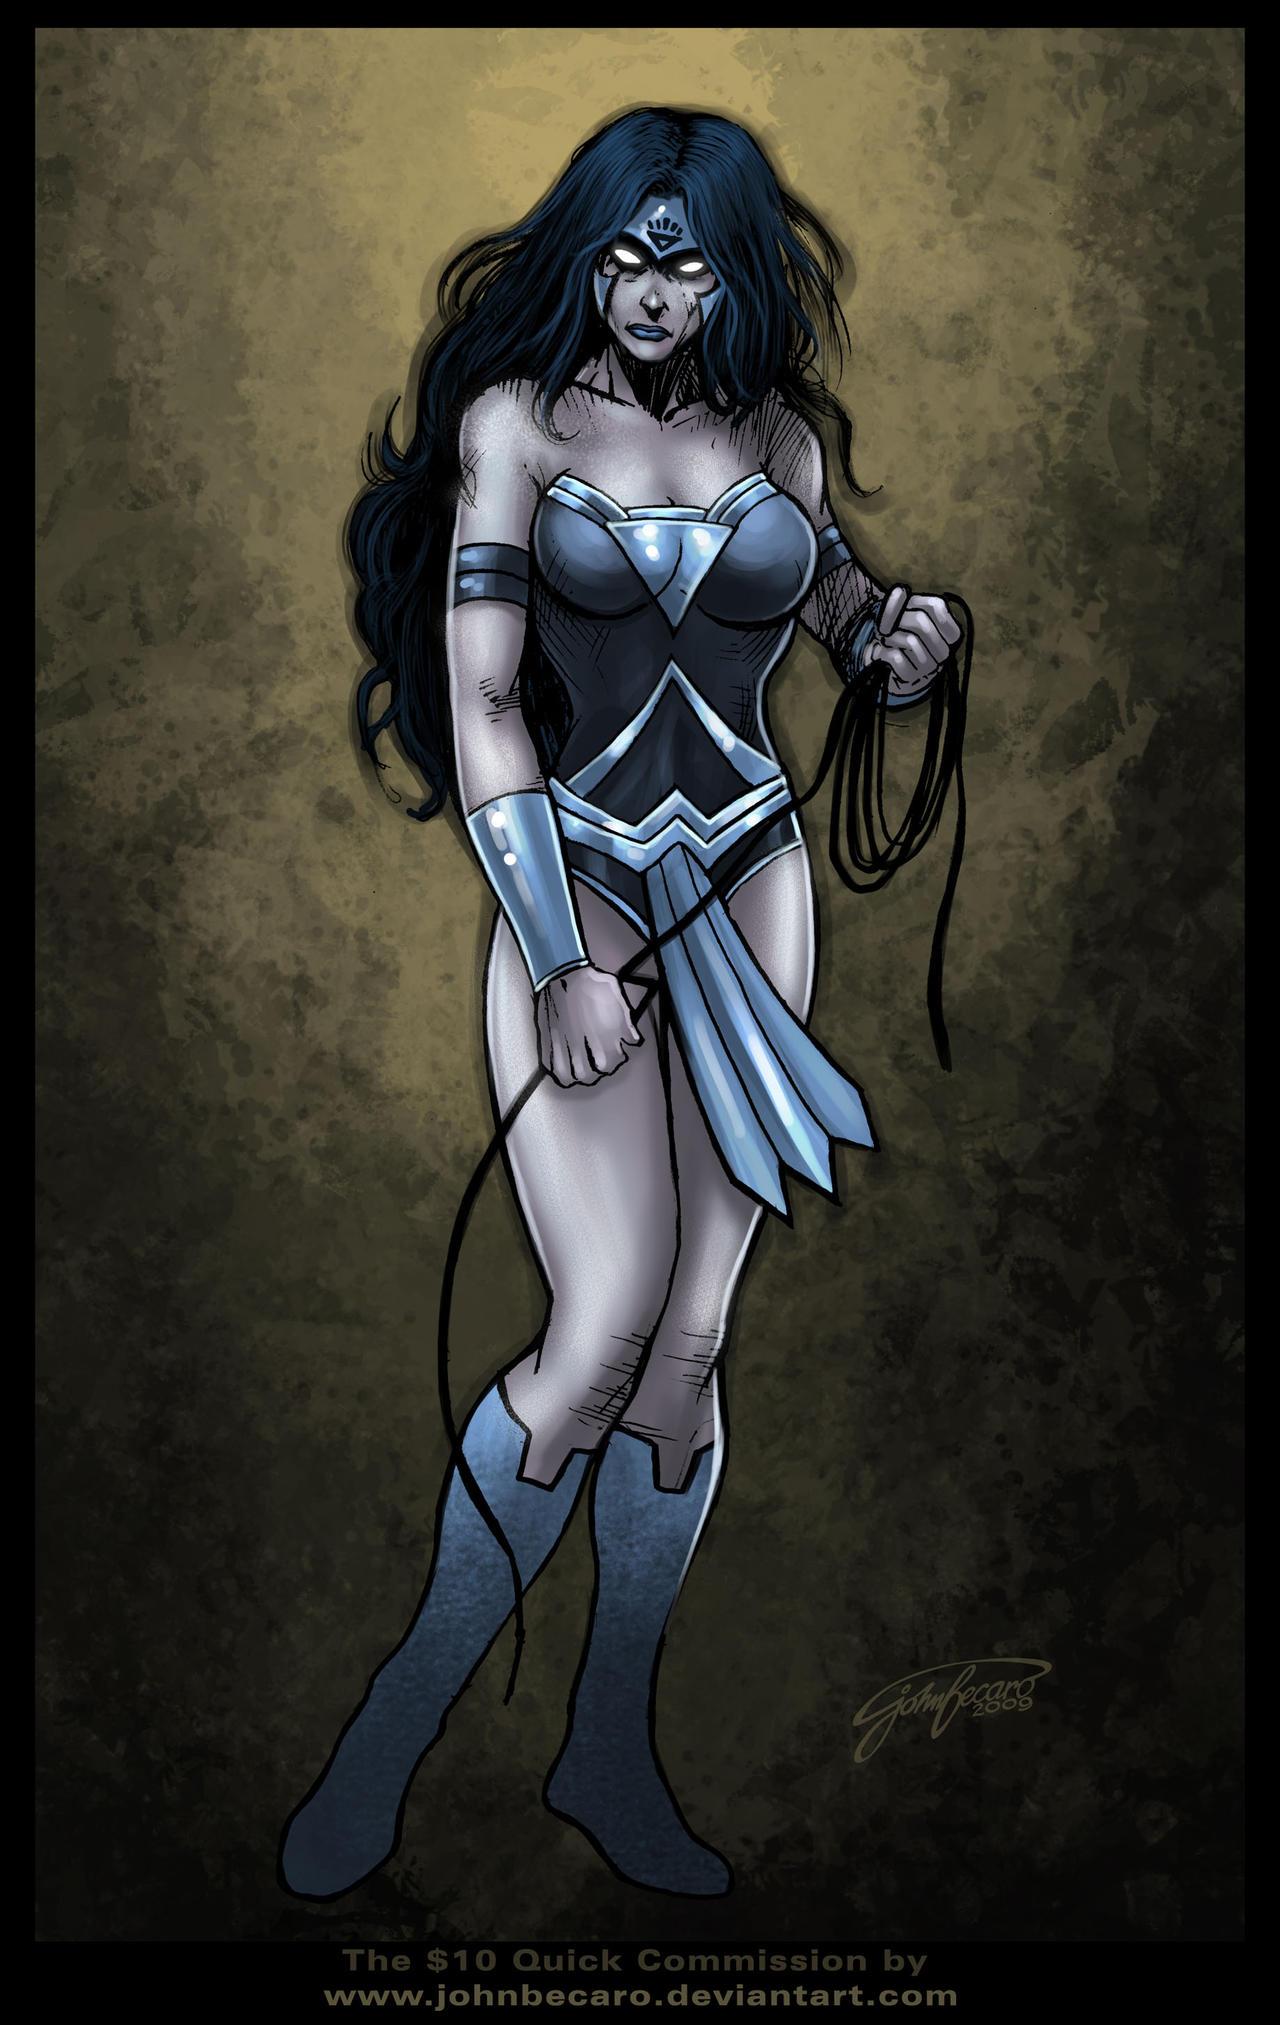 Black Lantern WonderWoman by johnbecaro